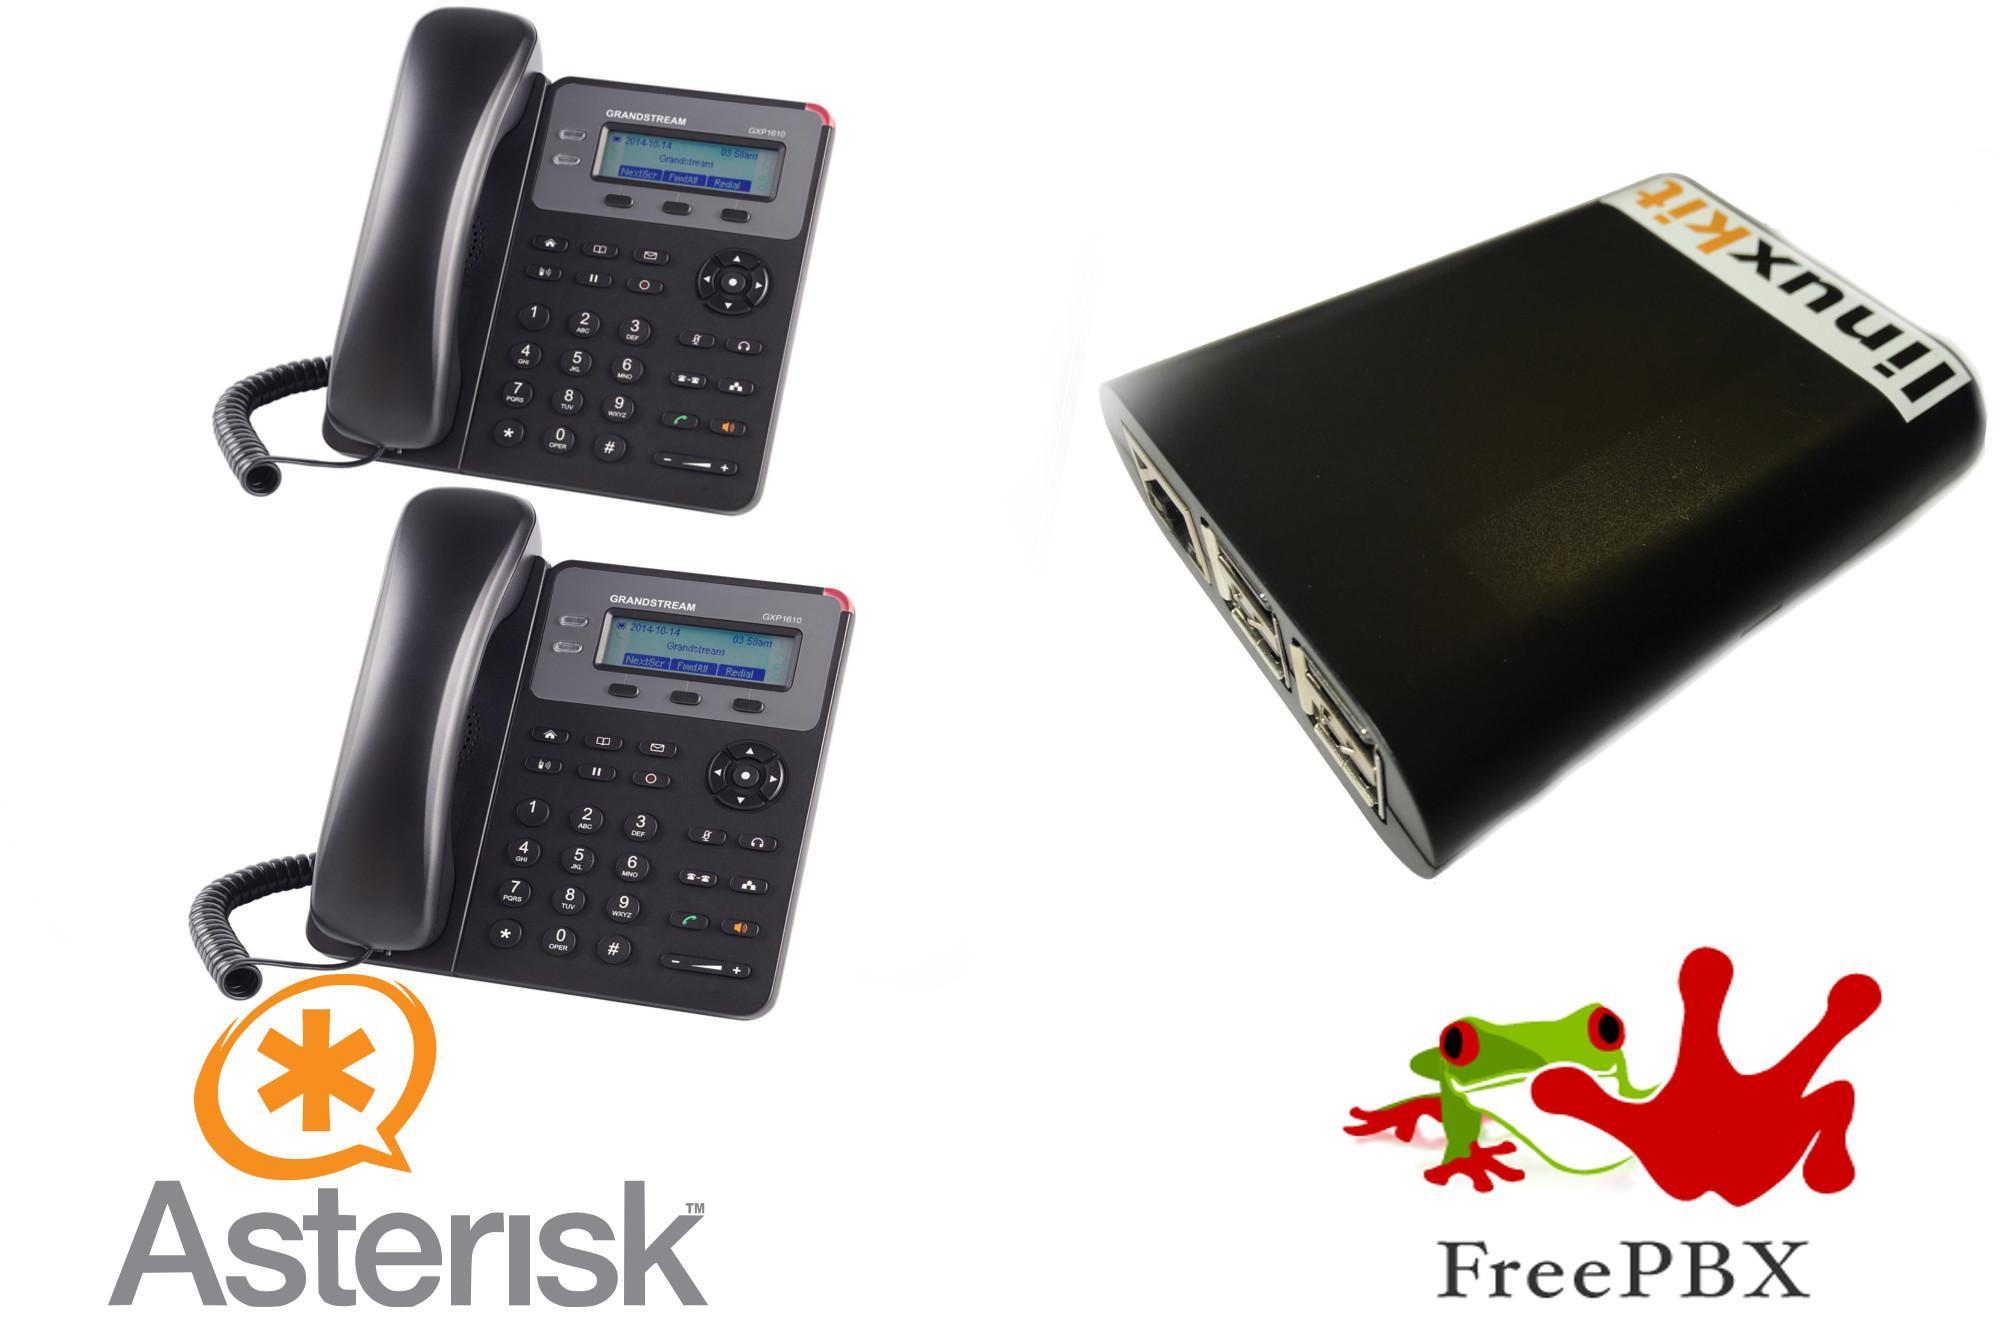 Asterisk BundleKit - 2 IP Phones + Mini PBX Server VoIP